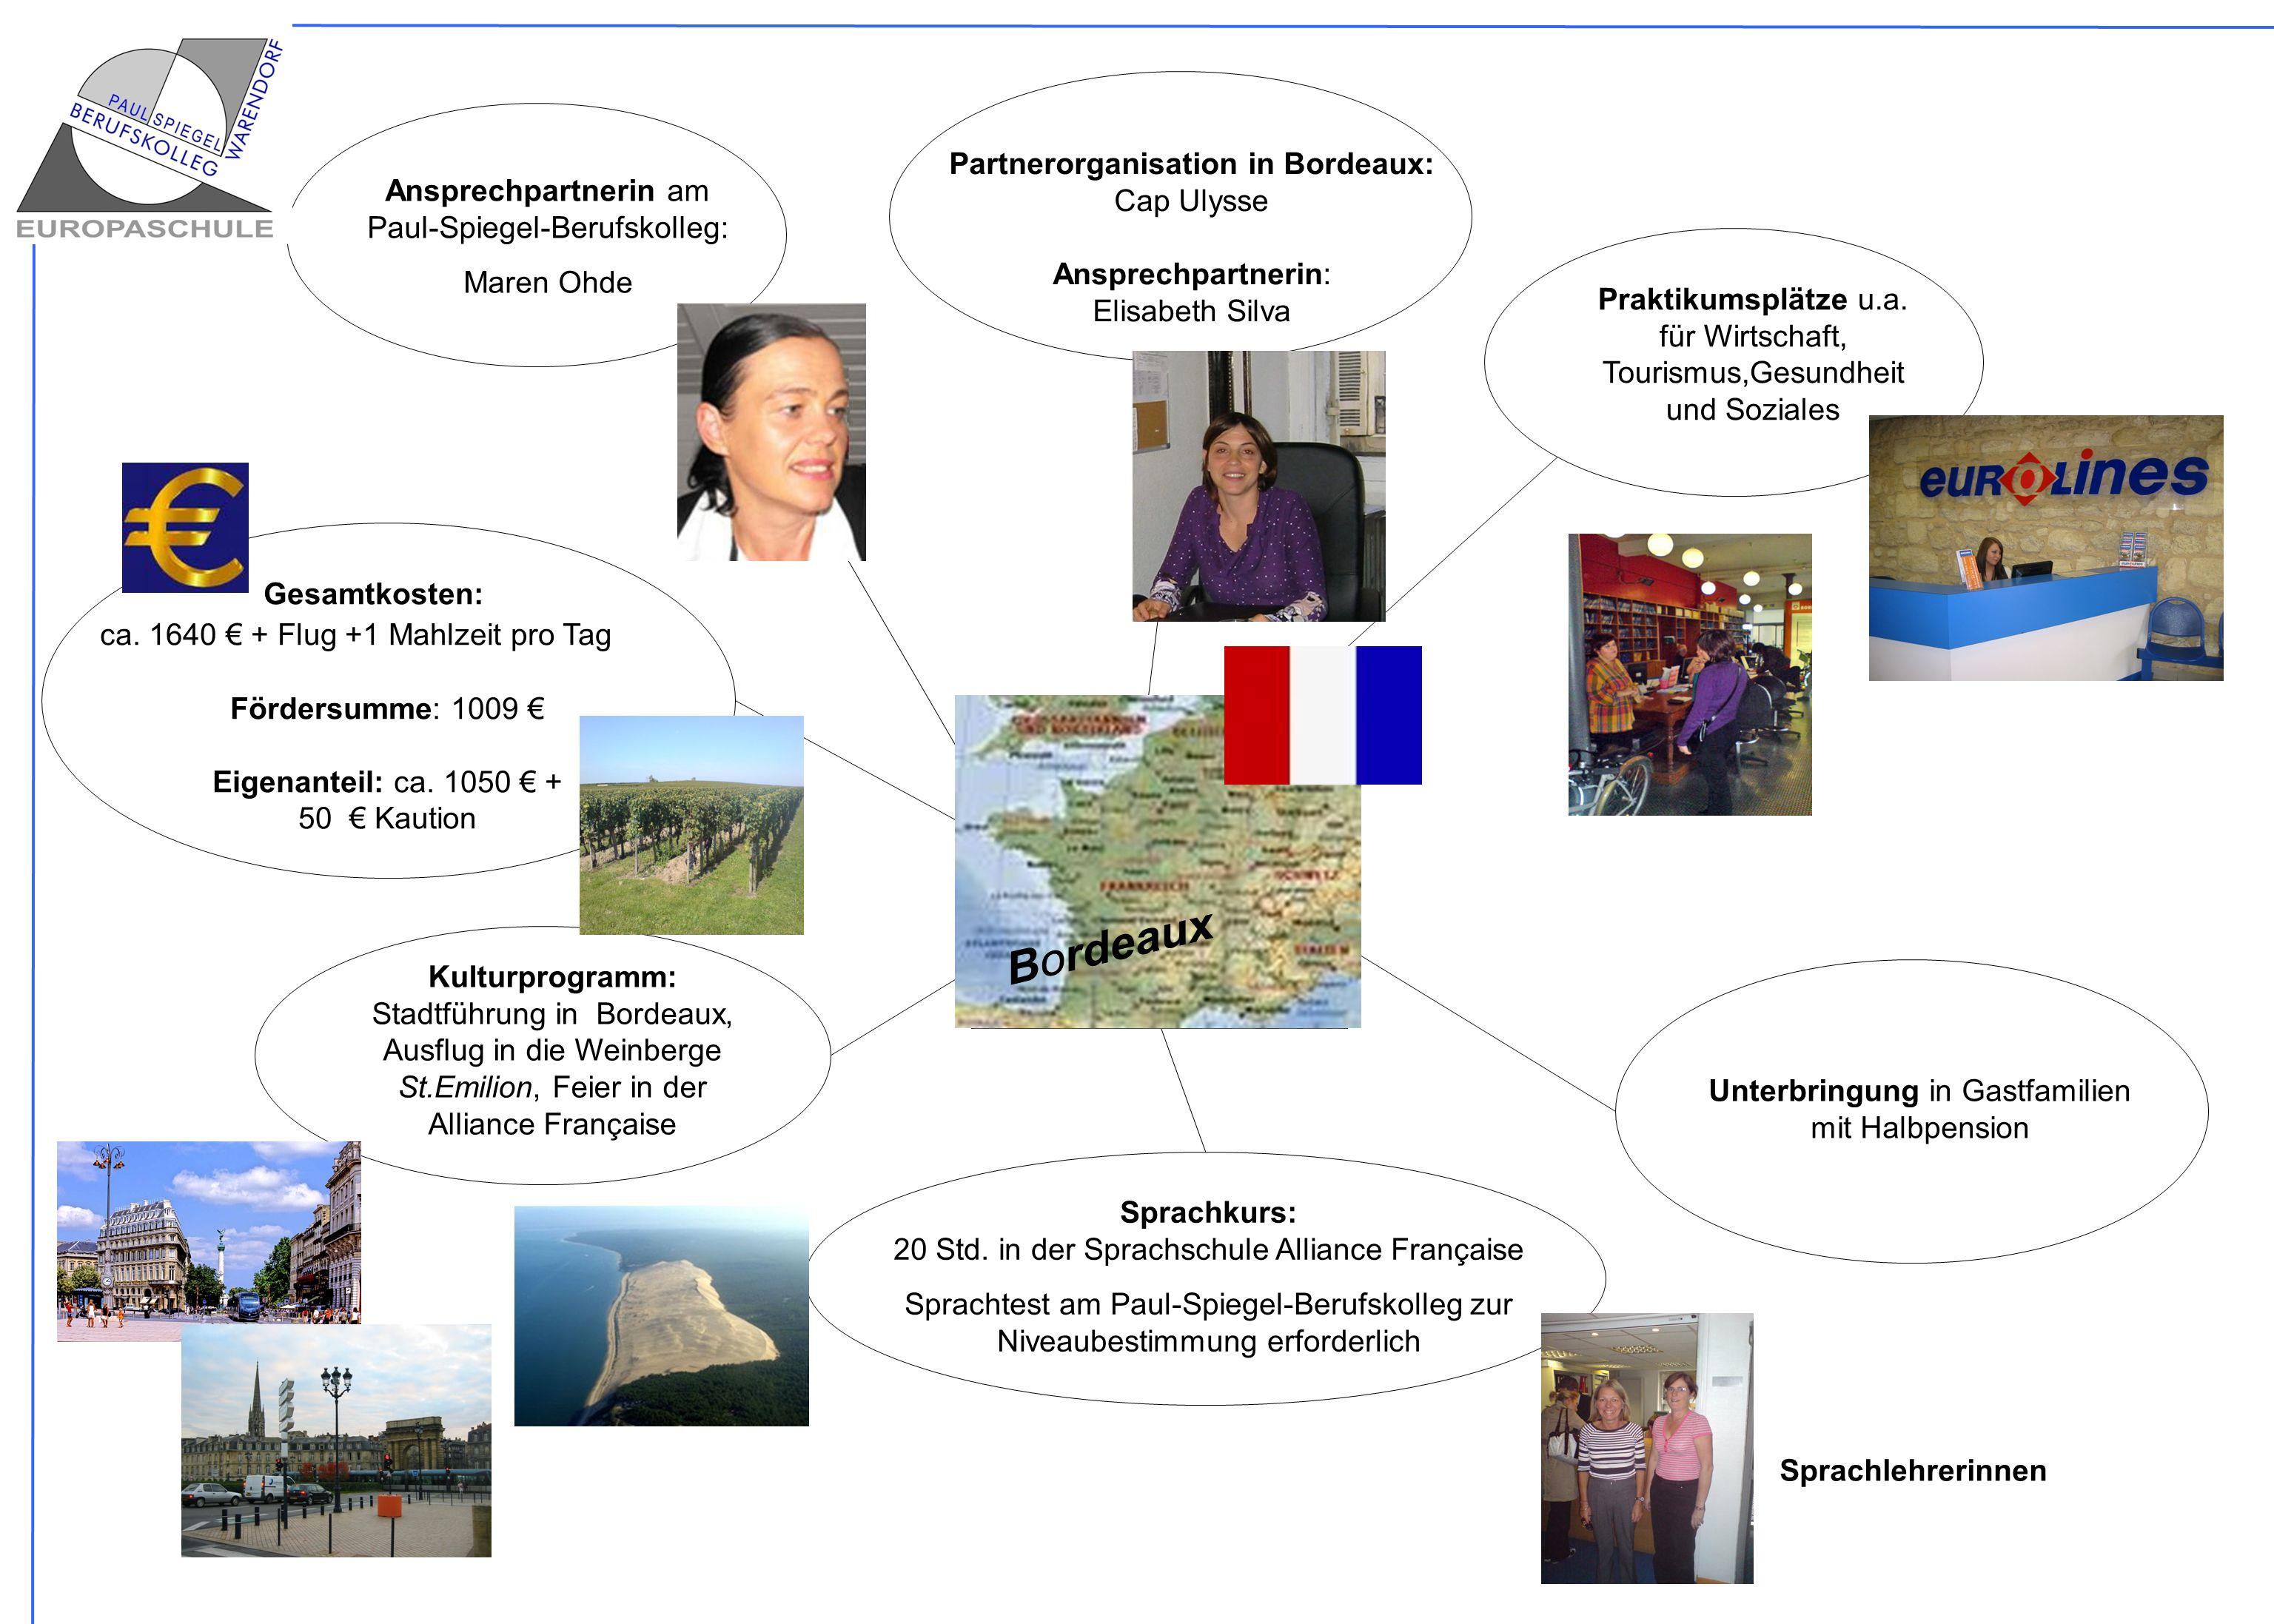 Partnerorganisation in Dublin: Internsplus Ansprechpartnerin: Margaret Purdy Praktikumsplätze u.a.